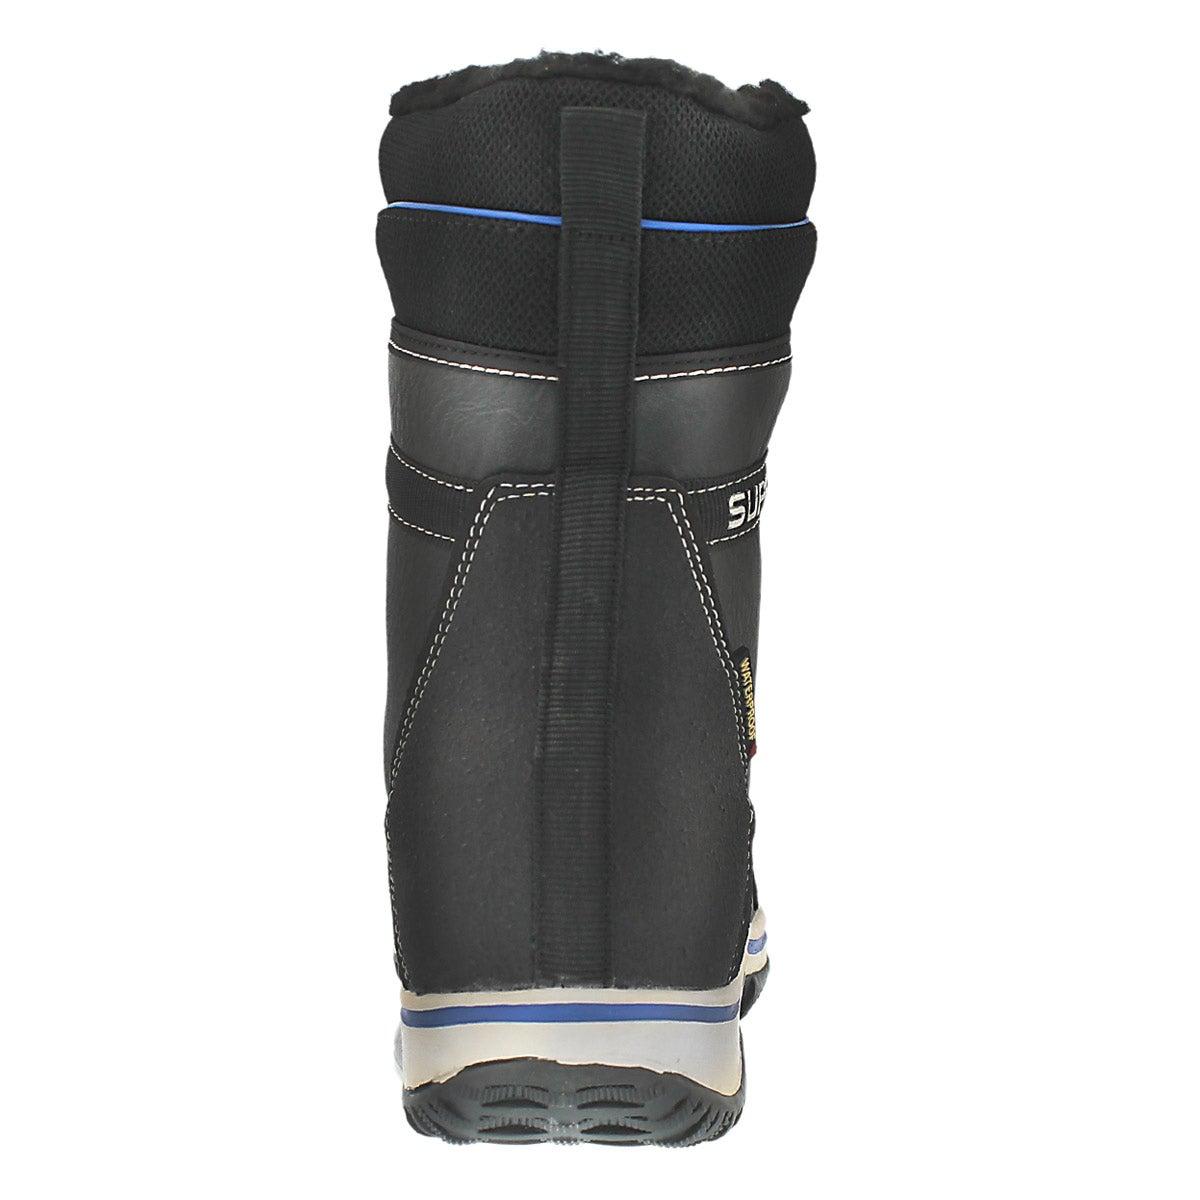 Bottes d'hiver Umber noir/char/bleu, gar